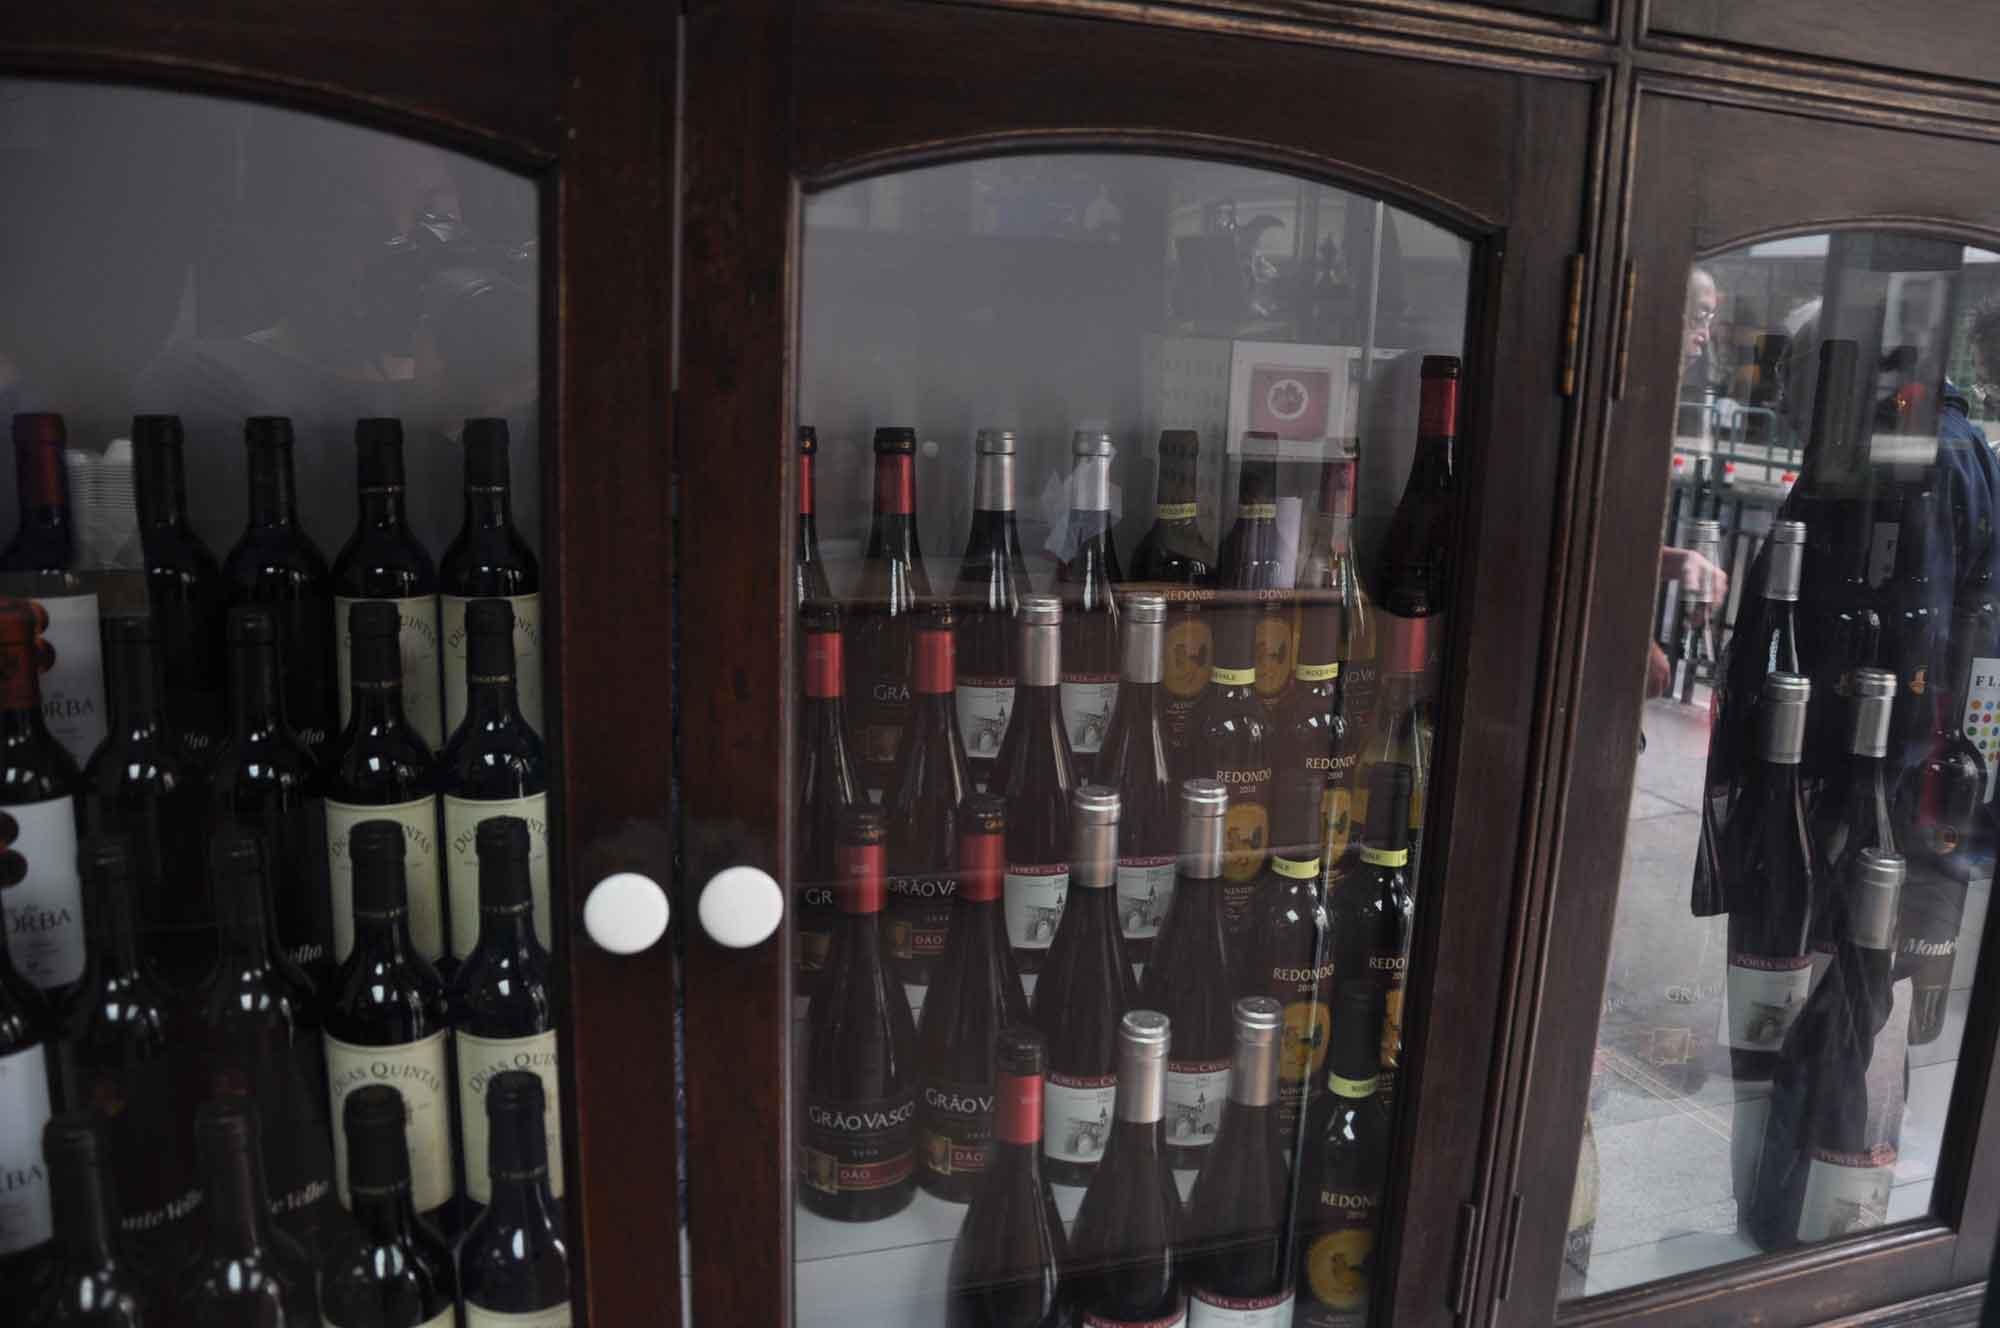 A Vencedora bottles of wine